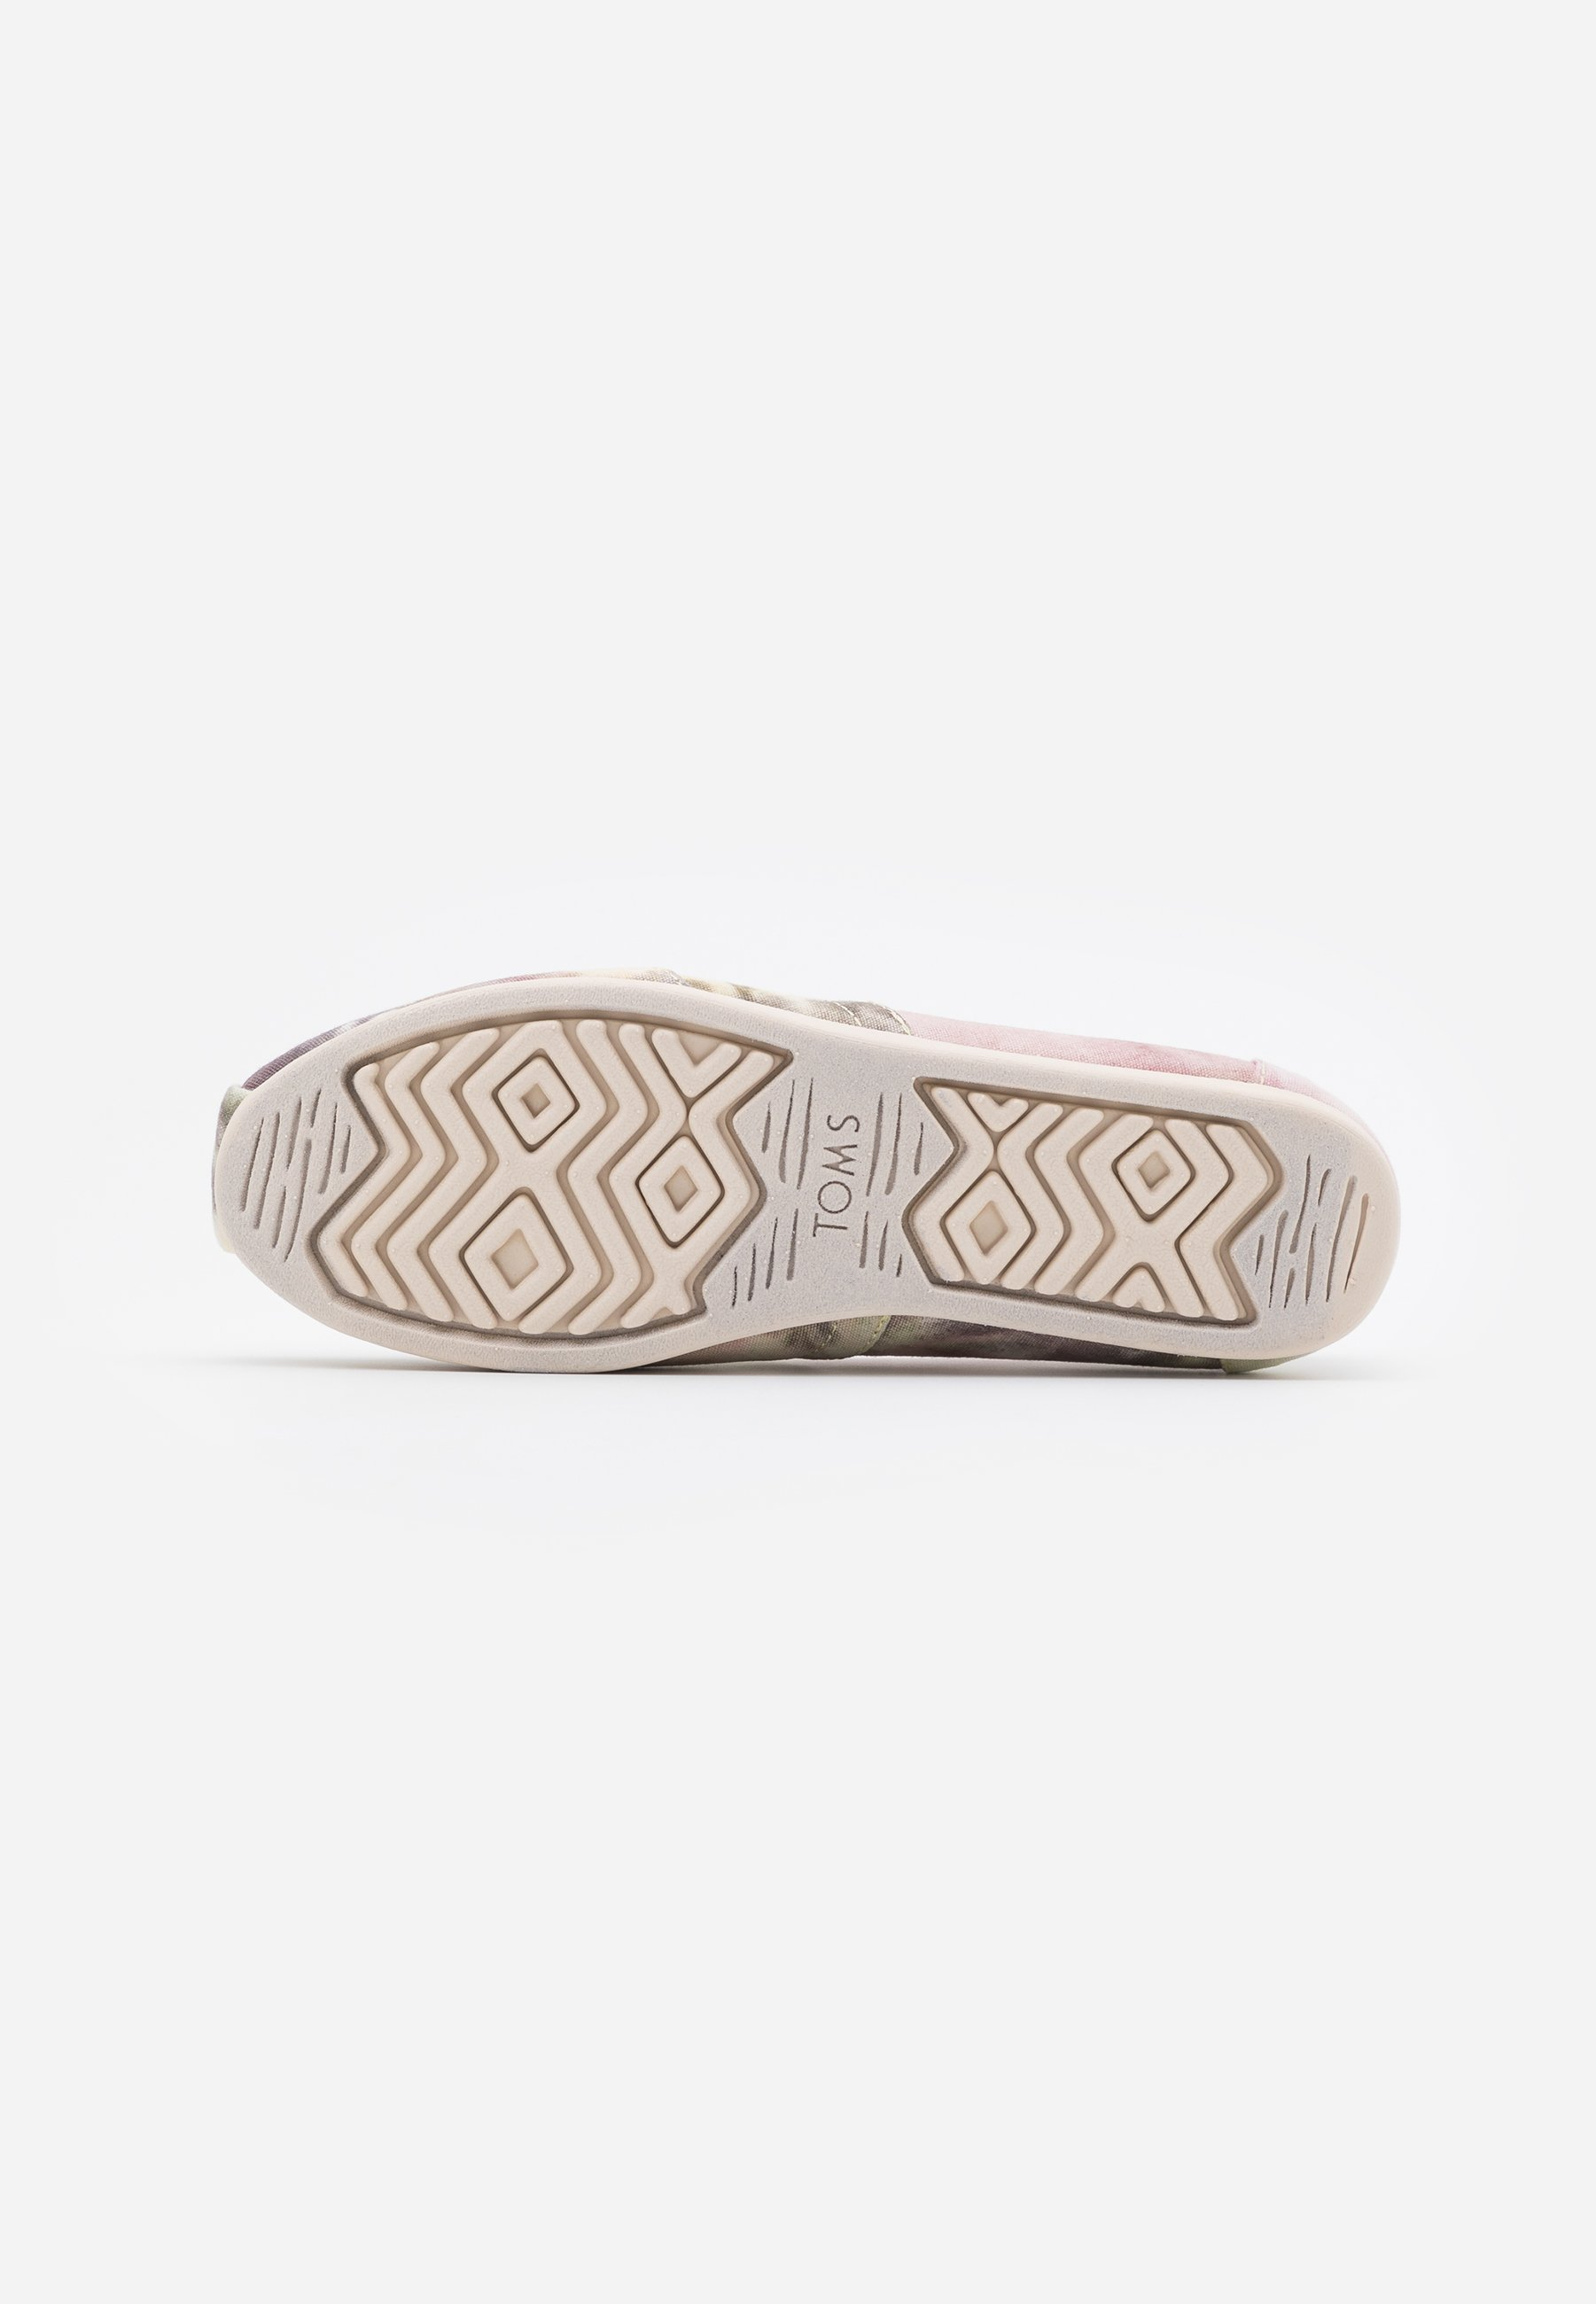 Scarpe da donna TOMS Scarpe senza lacci pink